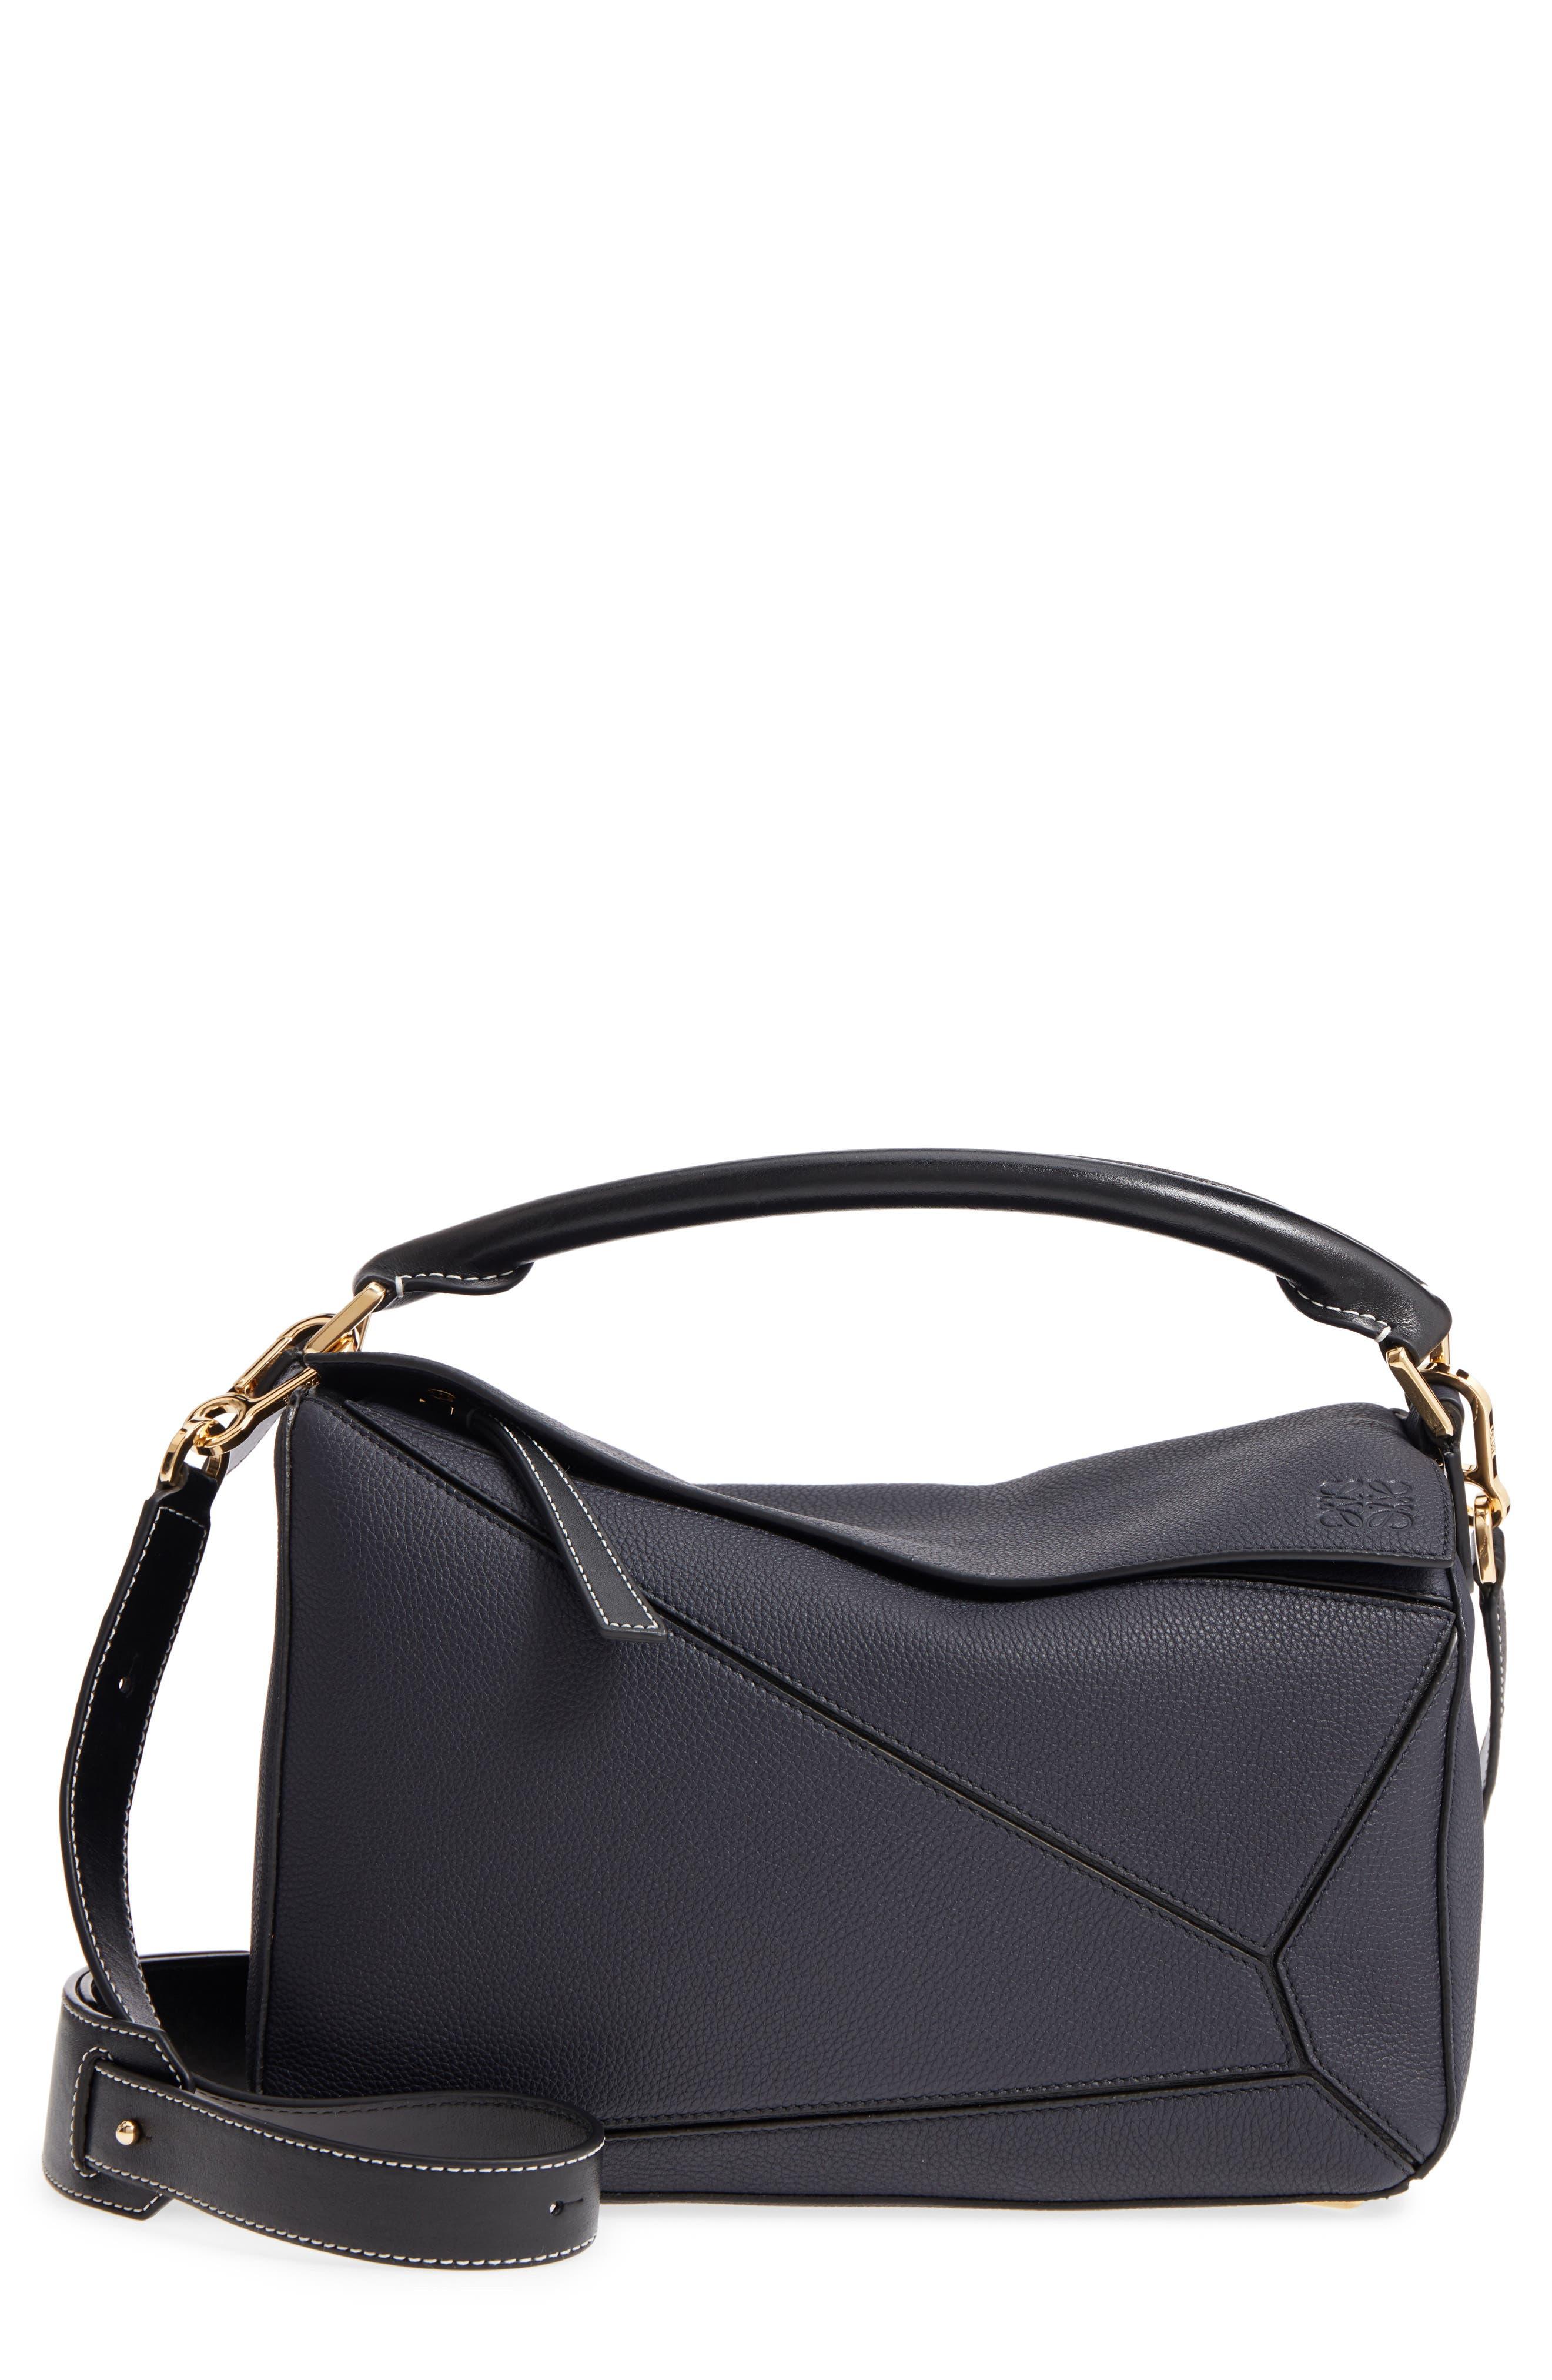 Loewe Medium Puzzle Leather Shoulder Bag